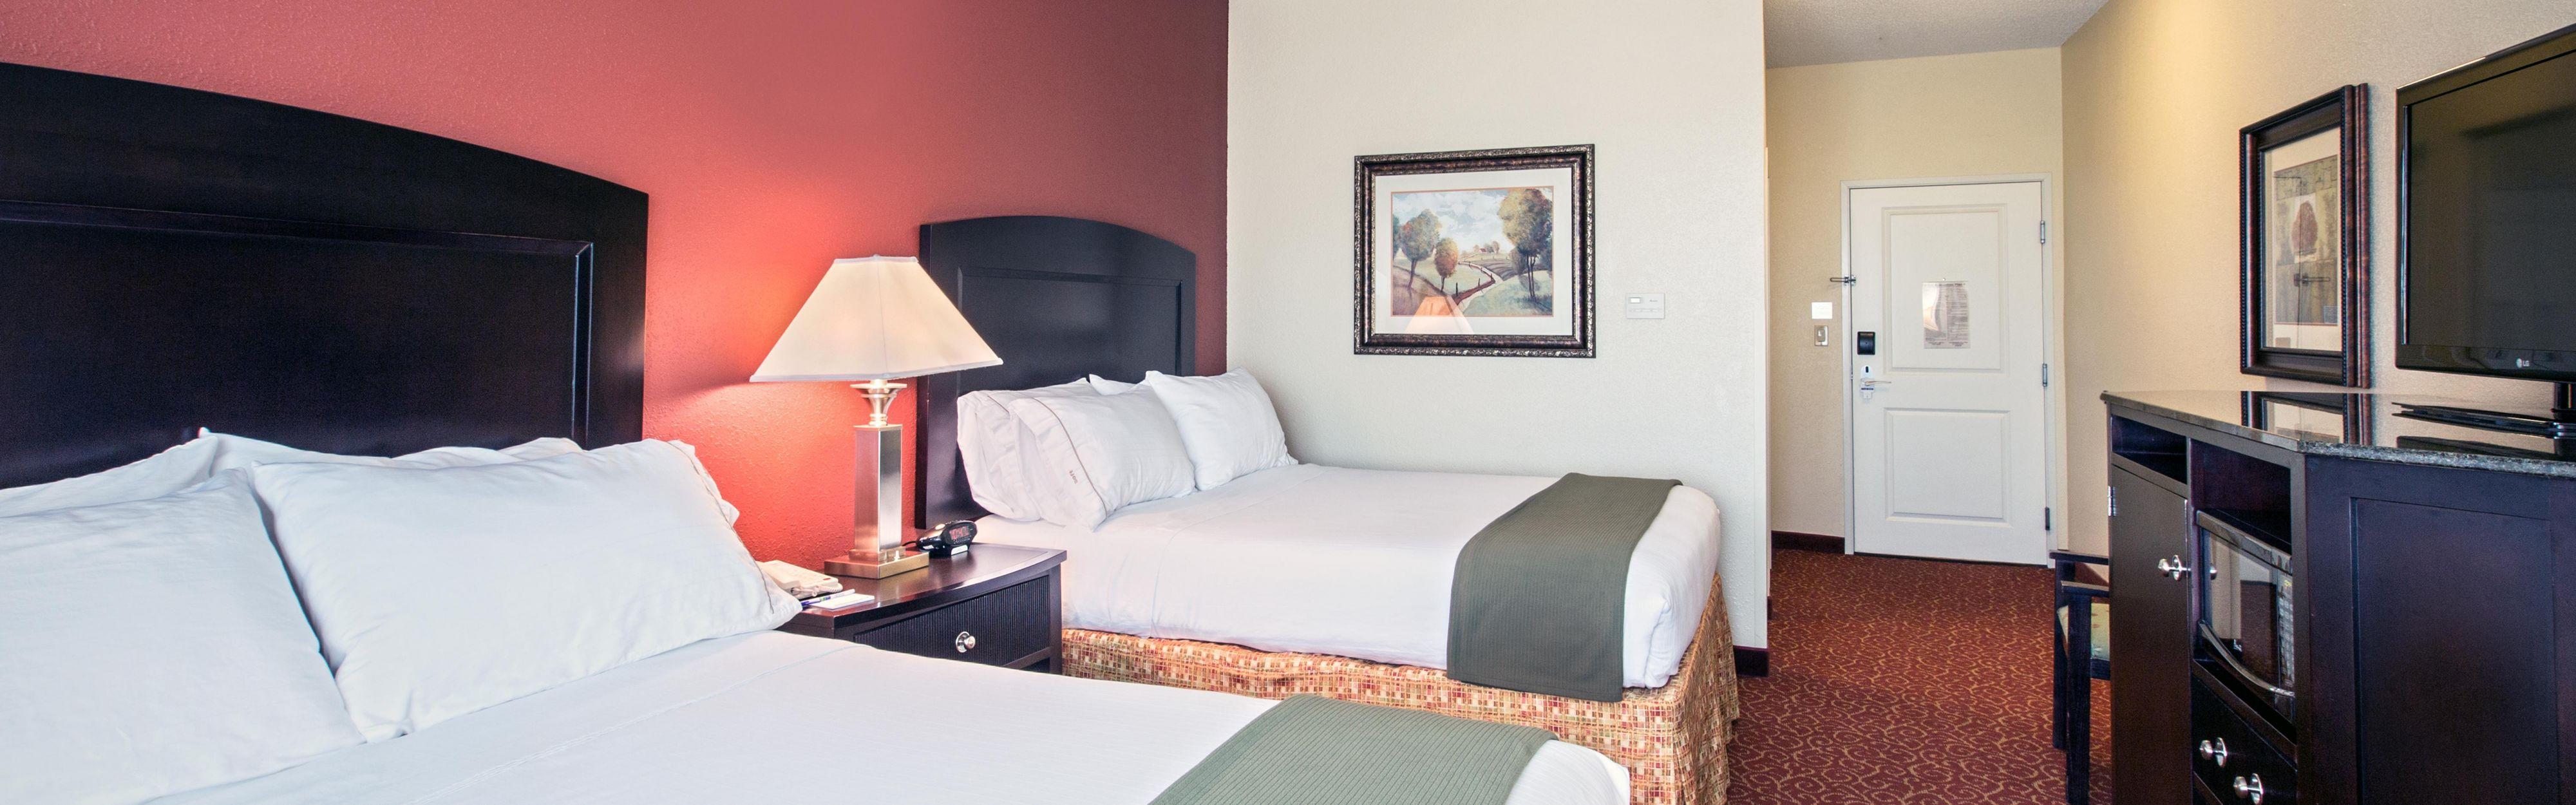 Holiday Inn Express & Suites Vandalia image 1